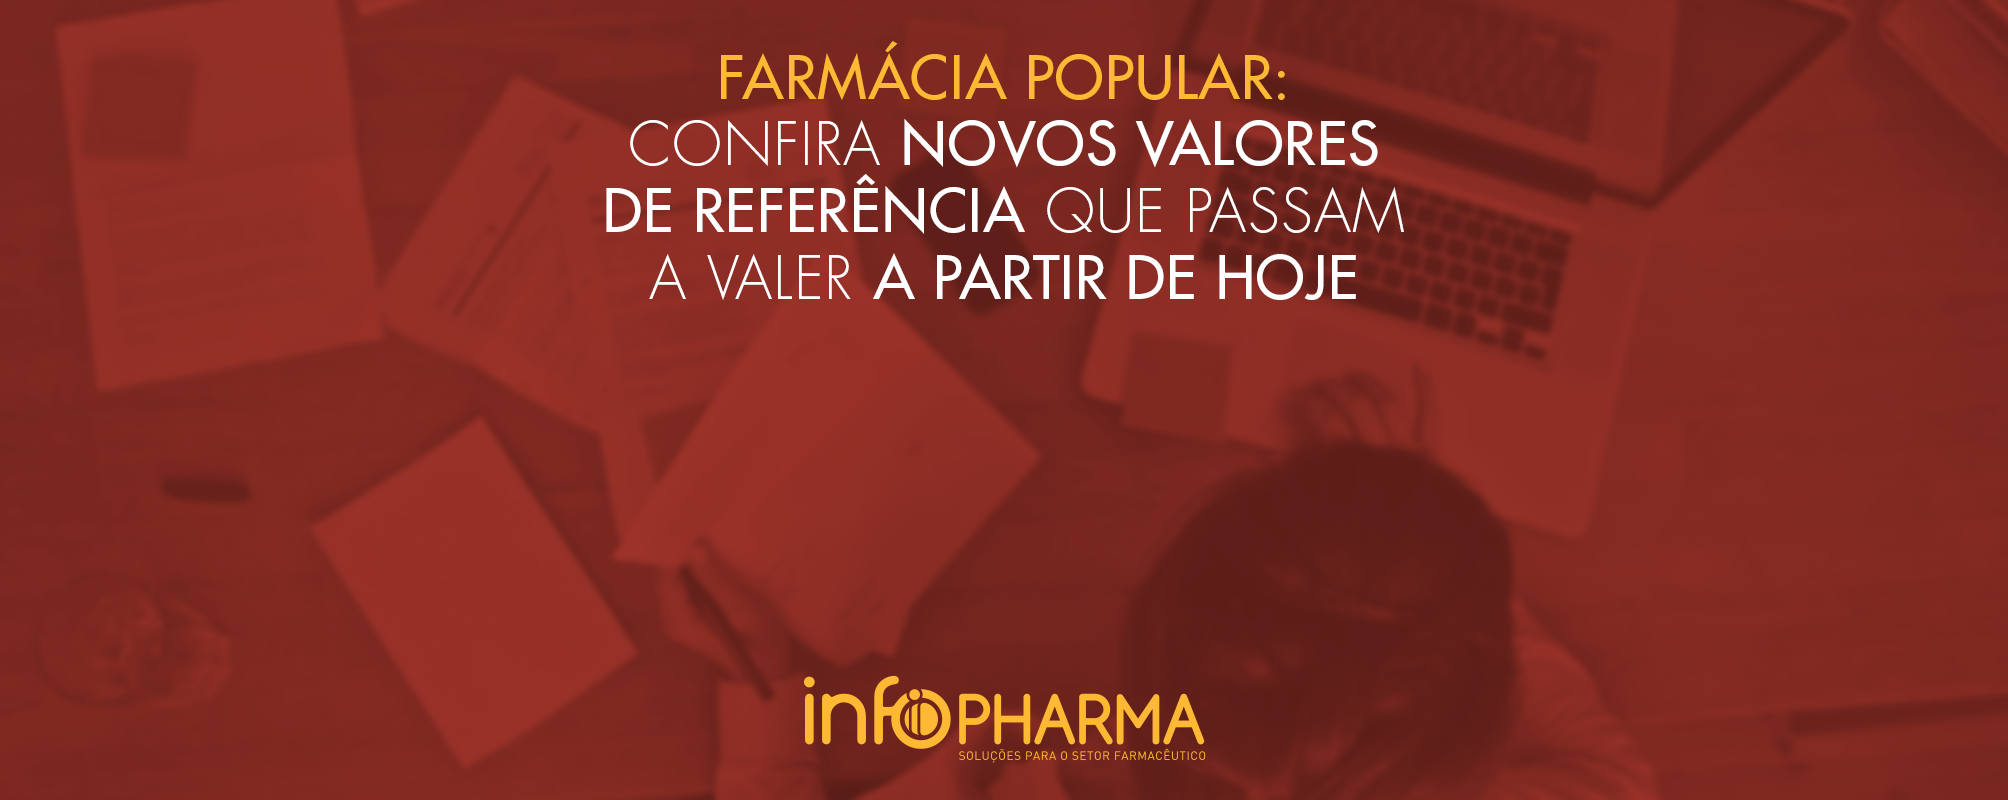 Farmácia Popular: confira novos Valores de Referência que